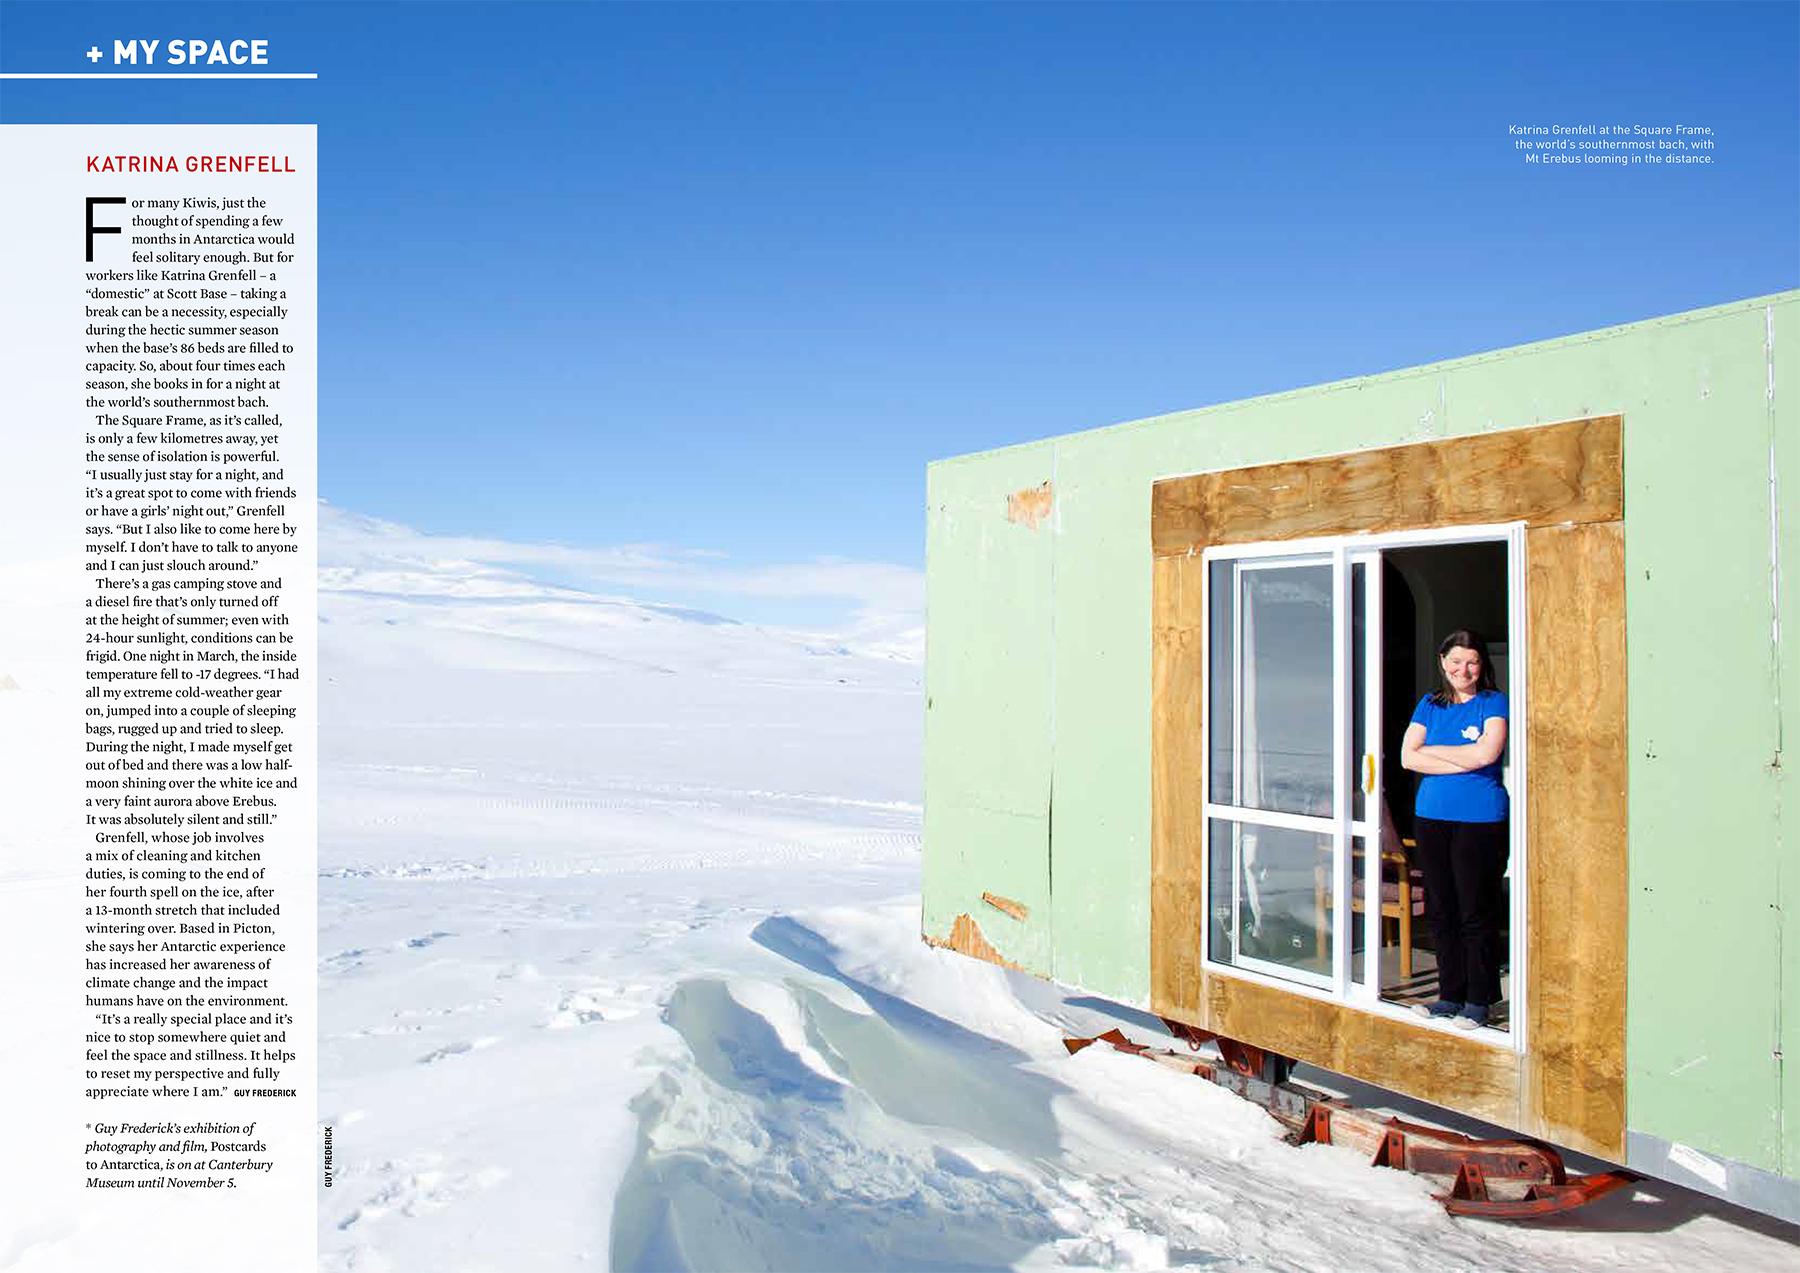 Antarcticamyspace.jpg